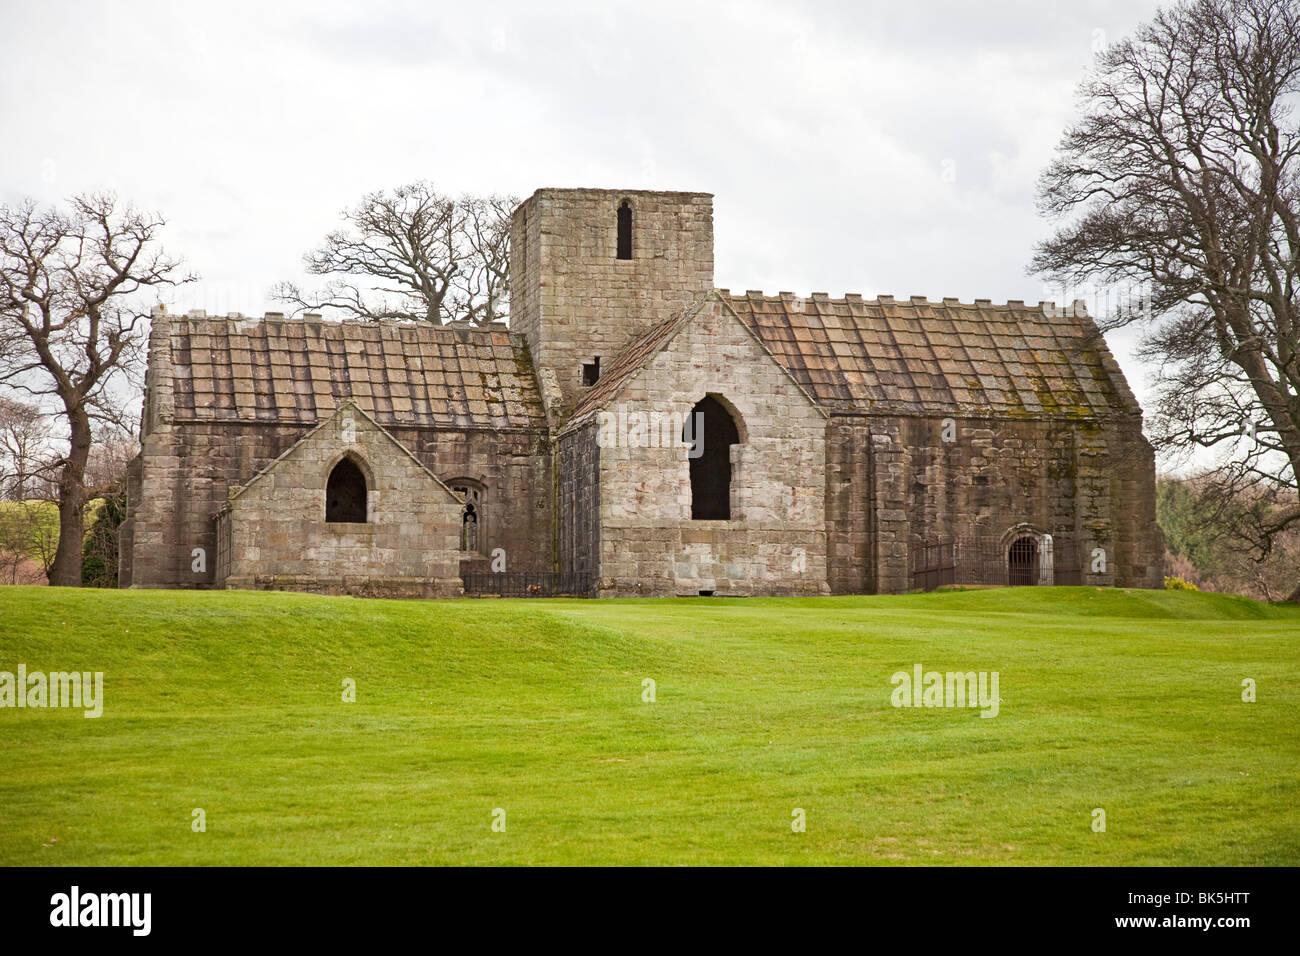 Dunglass Collegiate Church, a ruined but well-preserved 15th century pink sandstone church near Cockburnspath, Berwickshire, - Stock Image